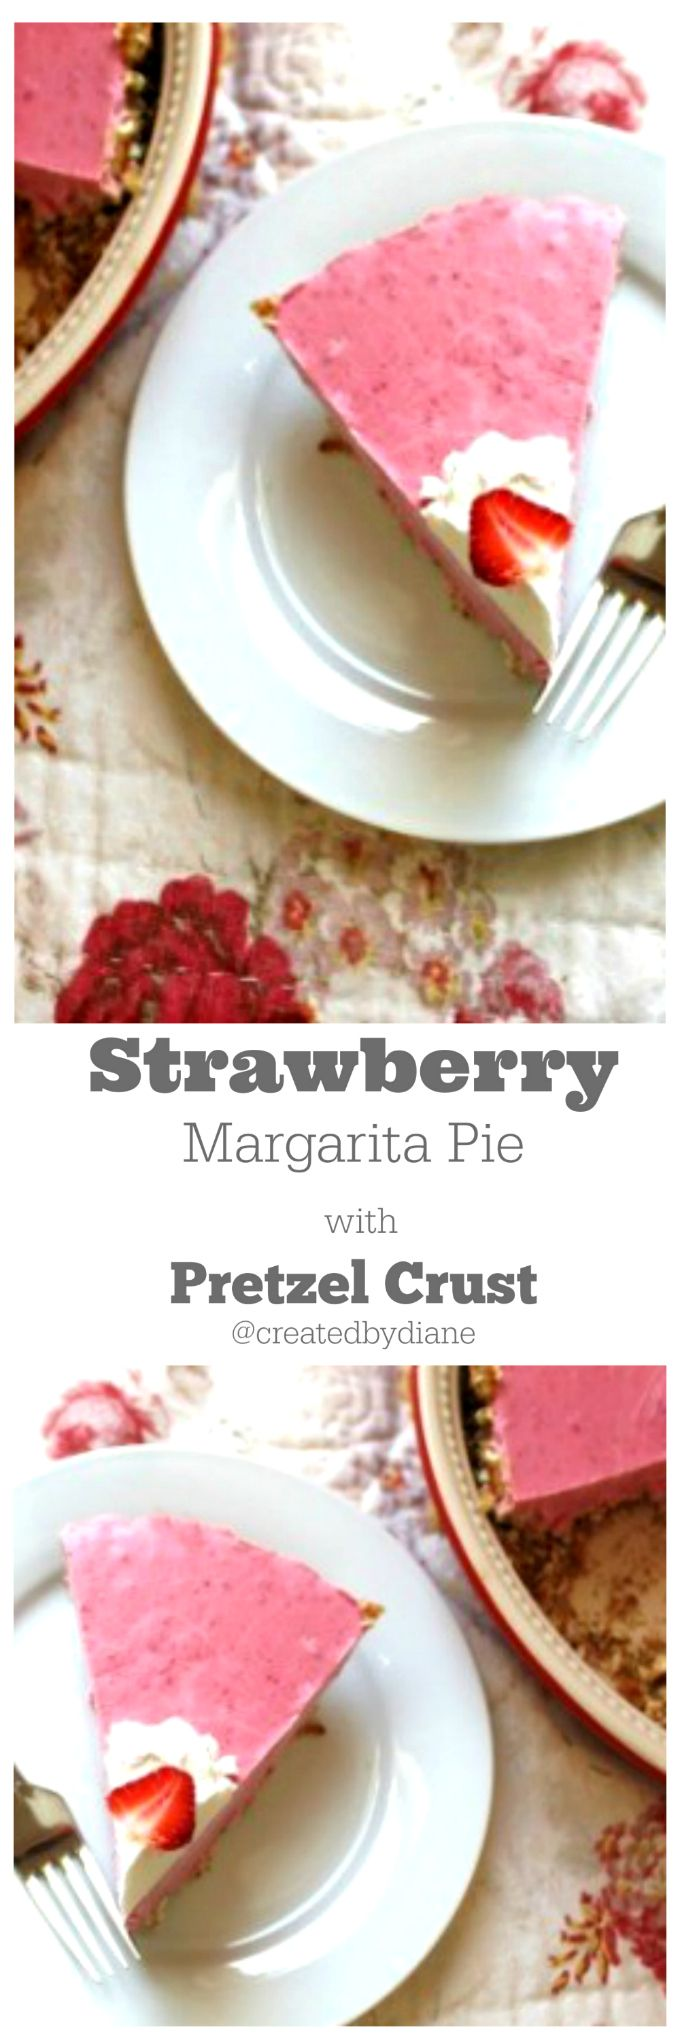 strawberry margarita pie @createdbydiane